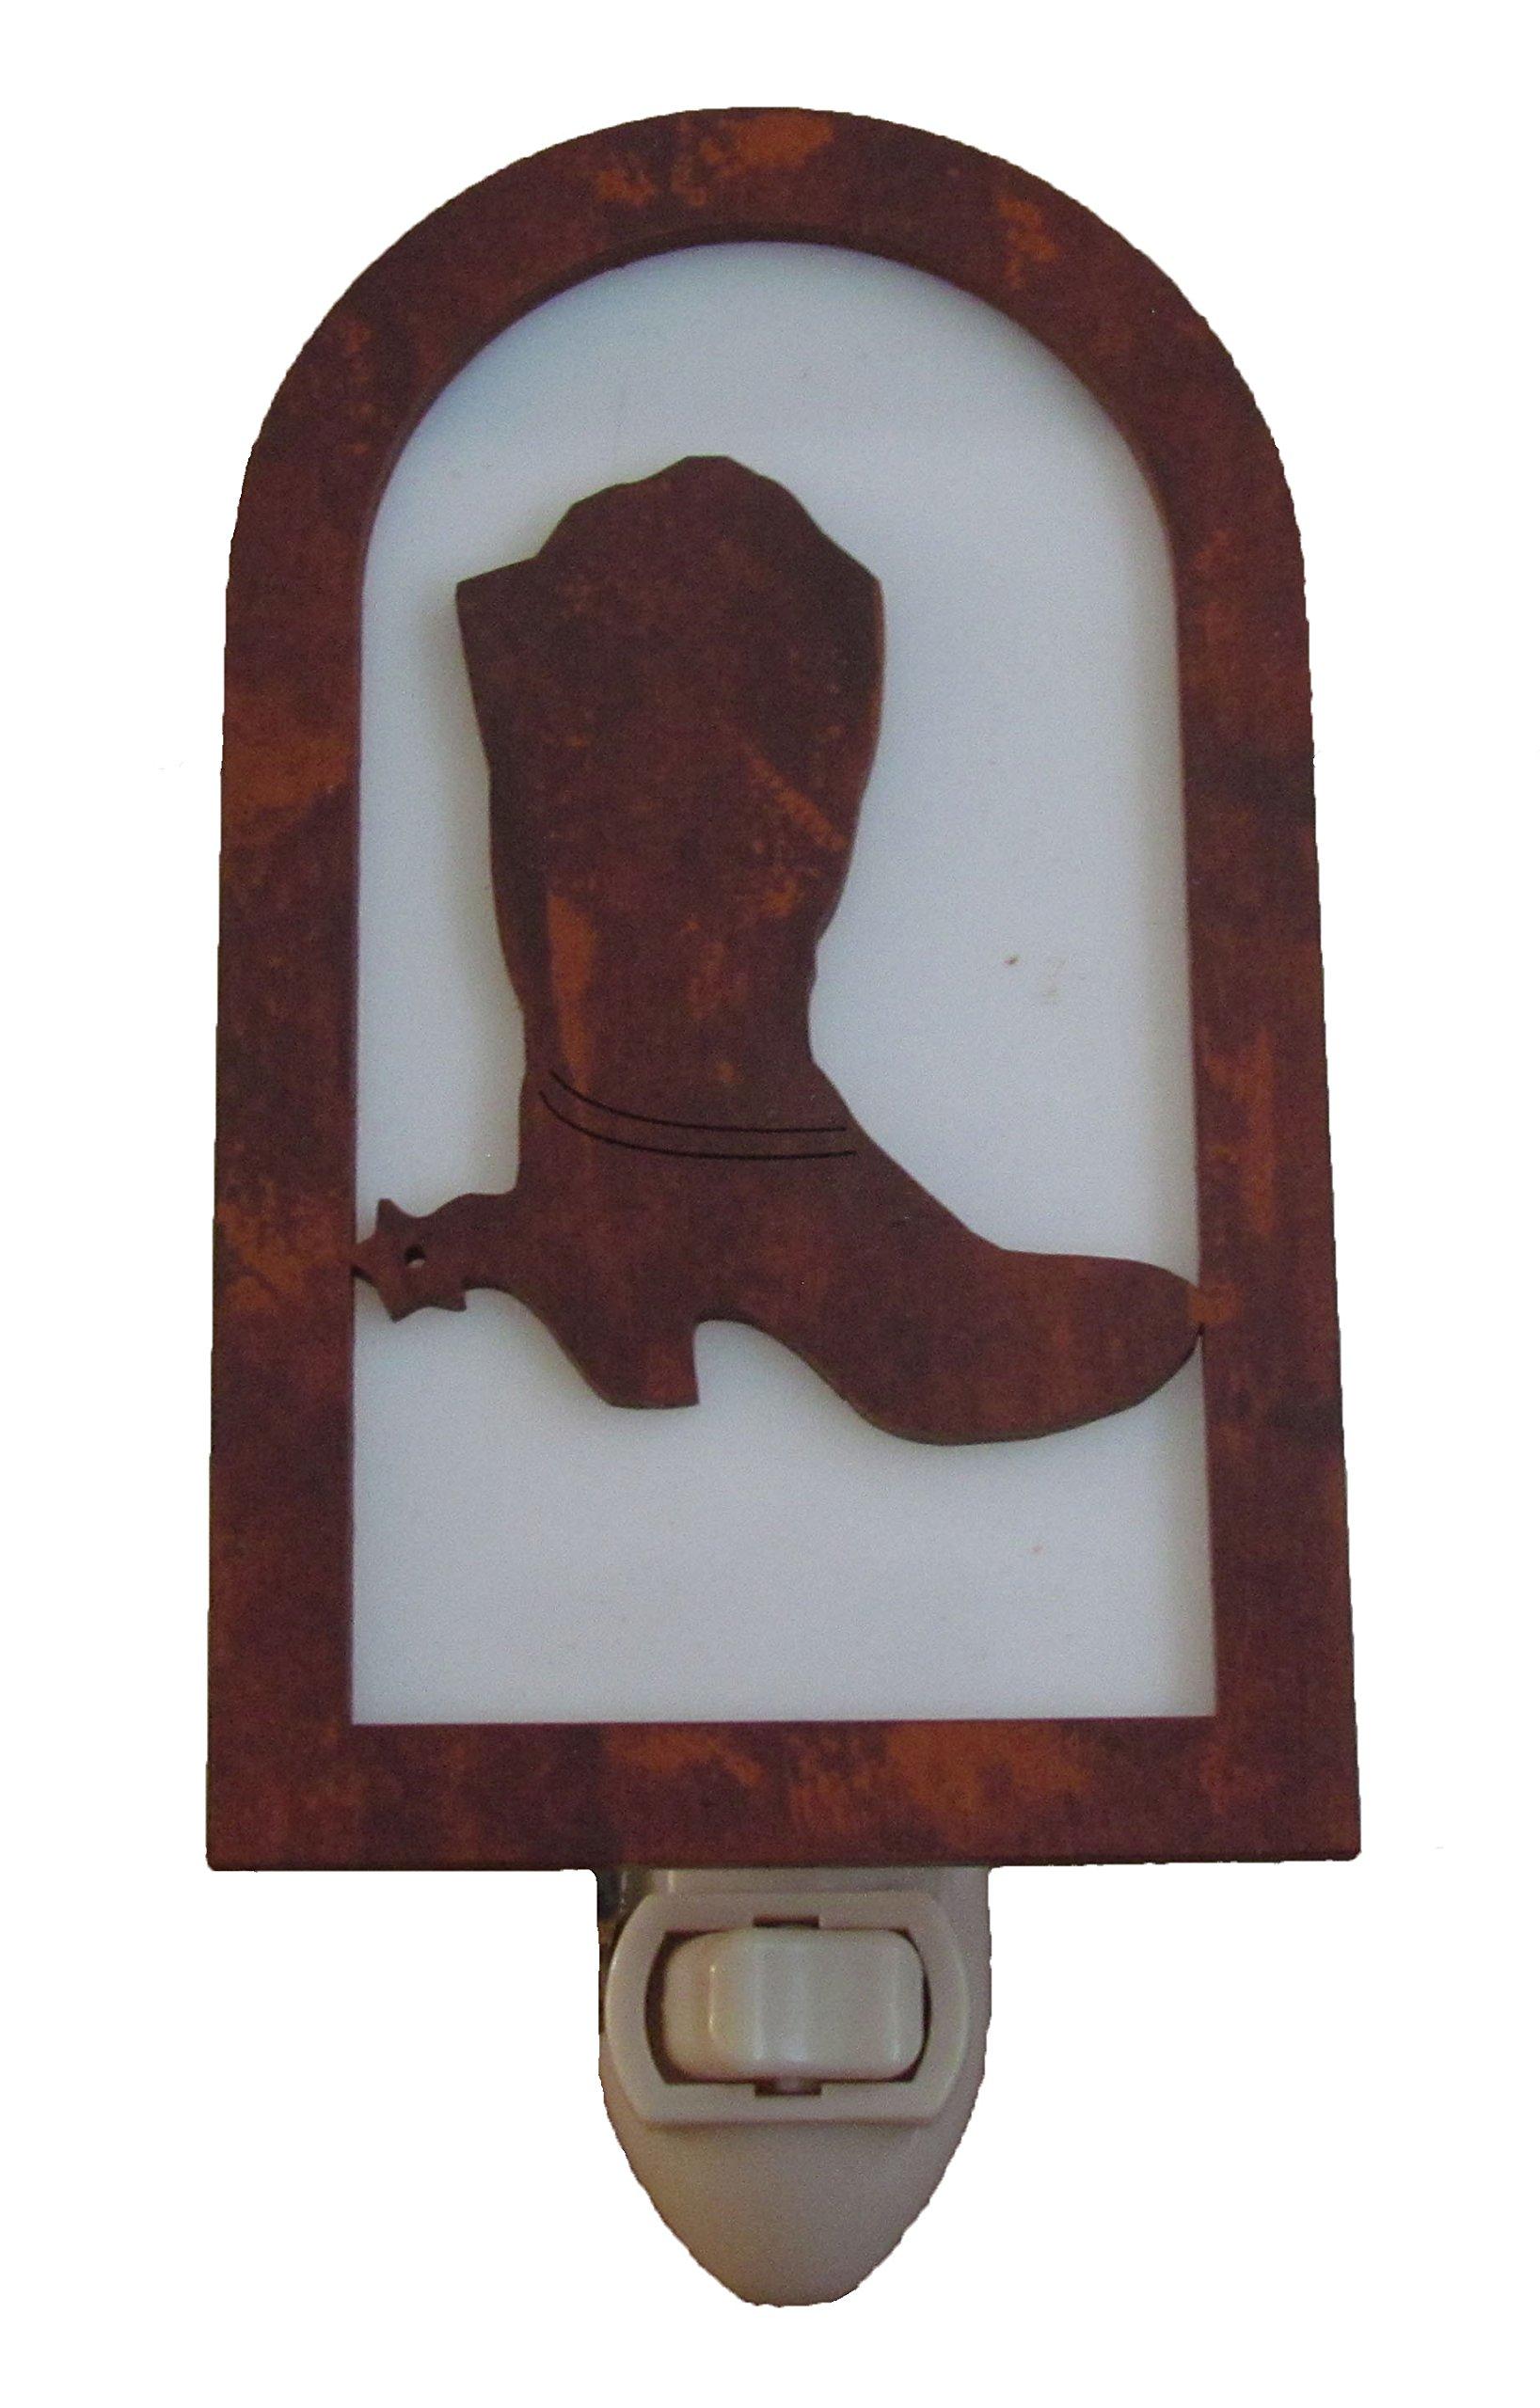 Rustic Boot Nightlight Made in USA Western Decor